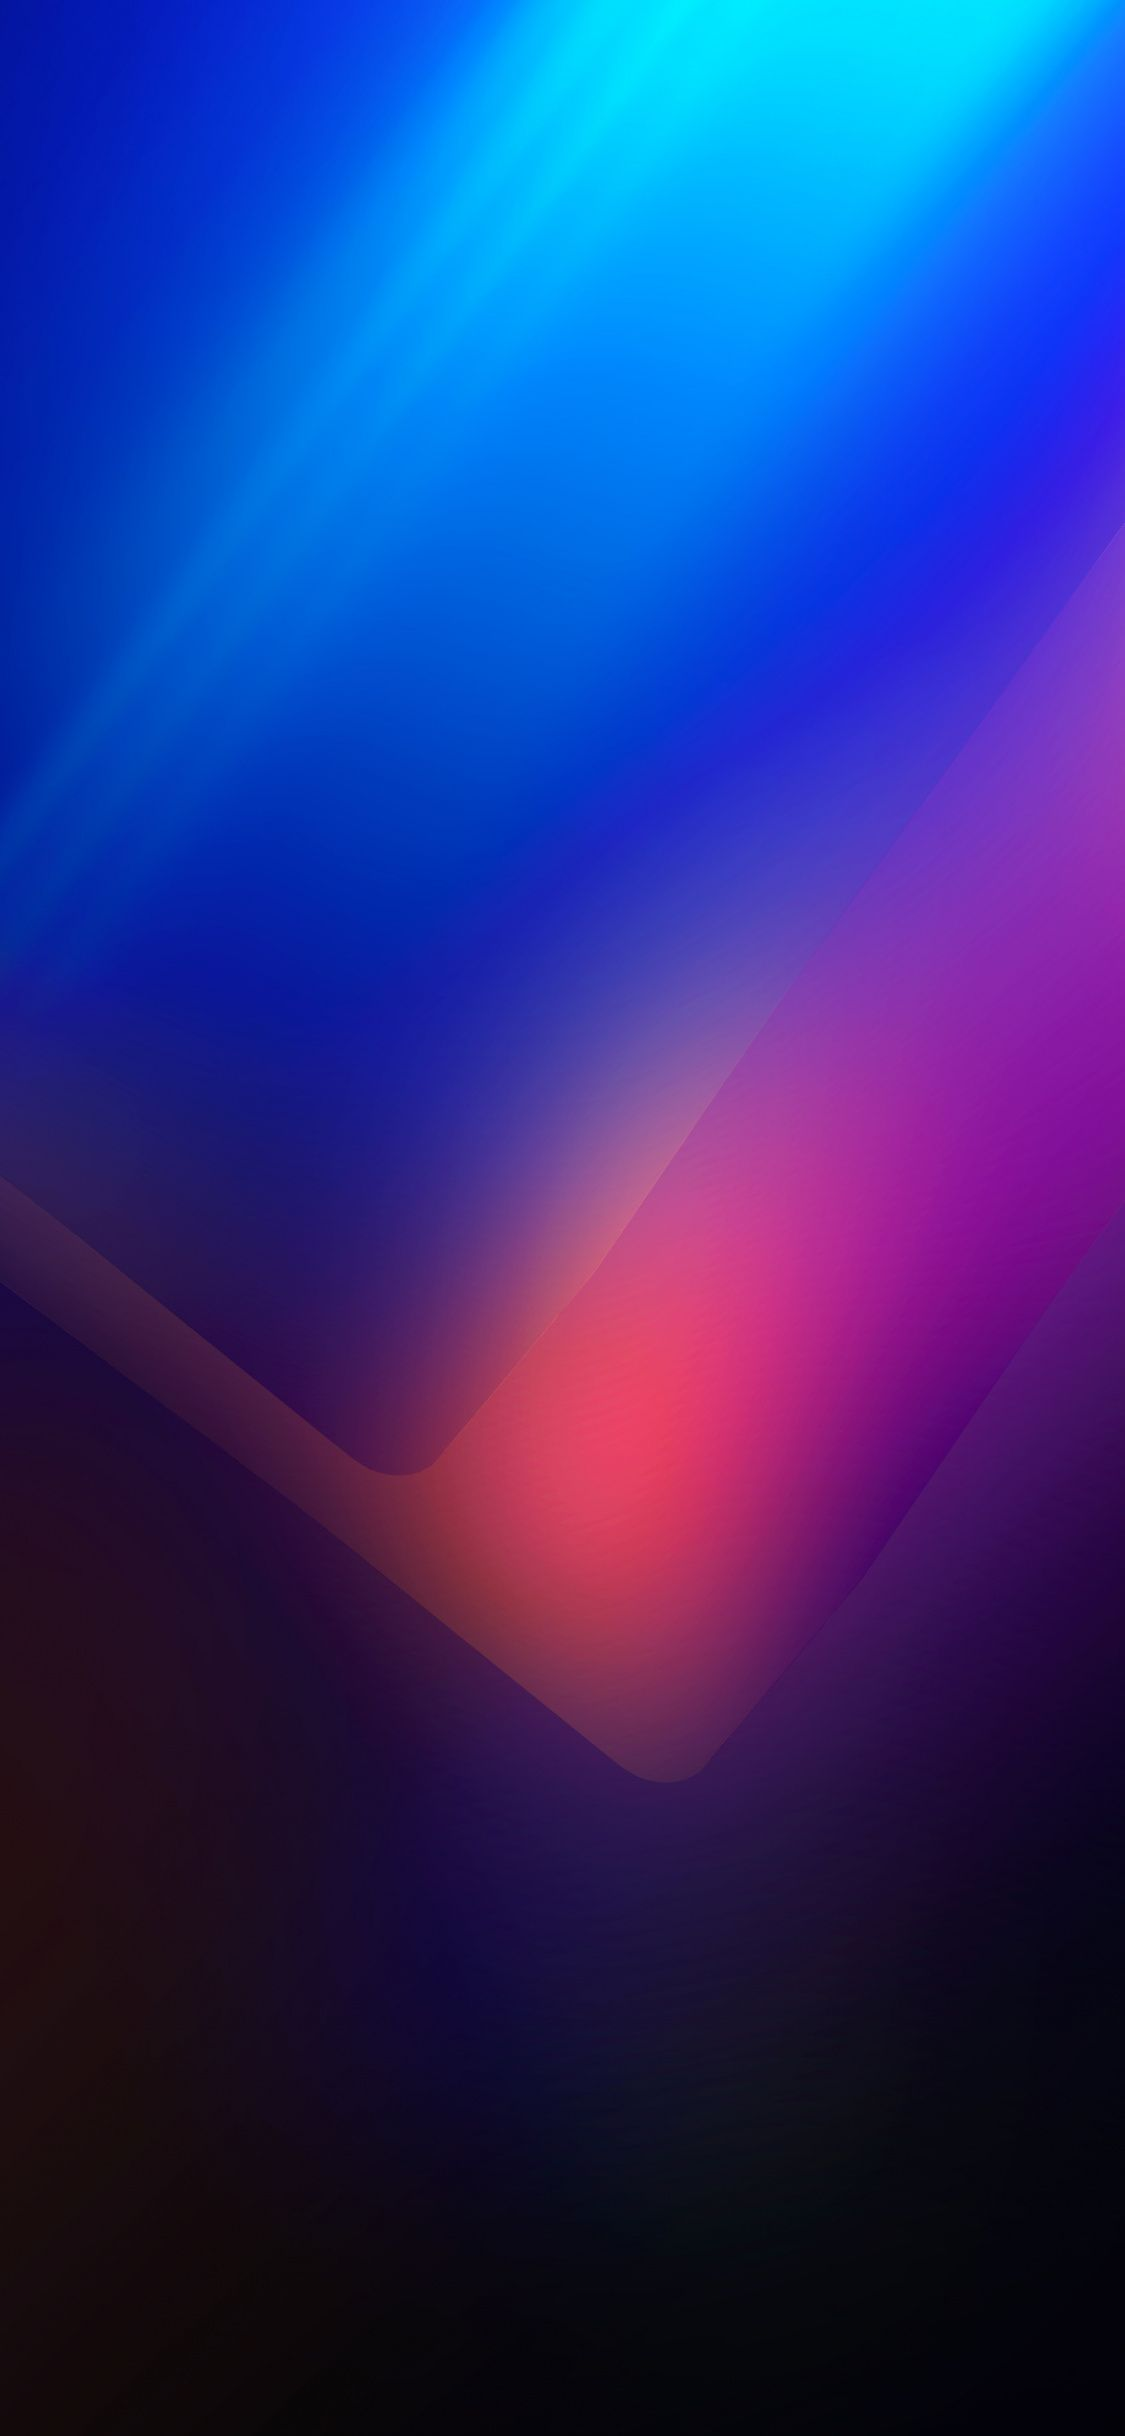 Download 1152x864 Wallpaper Vibrant And Vivid Edge Dark